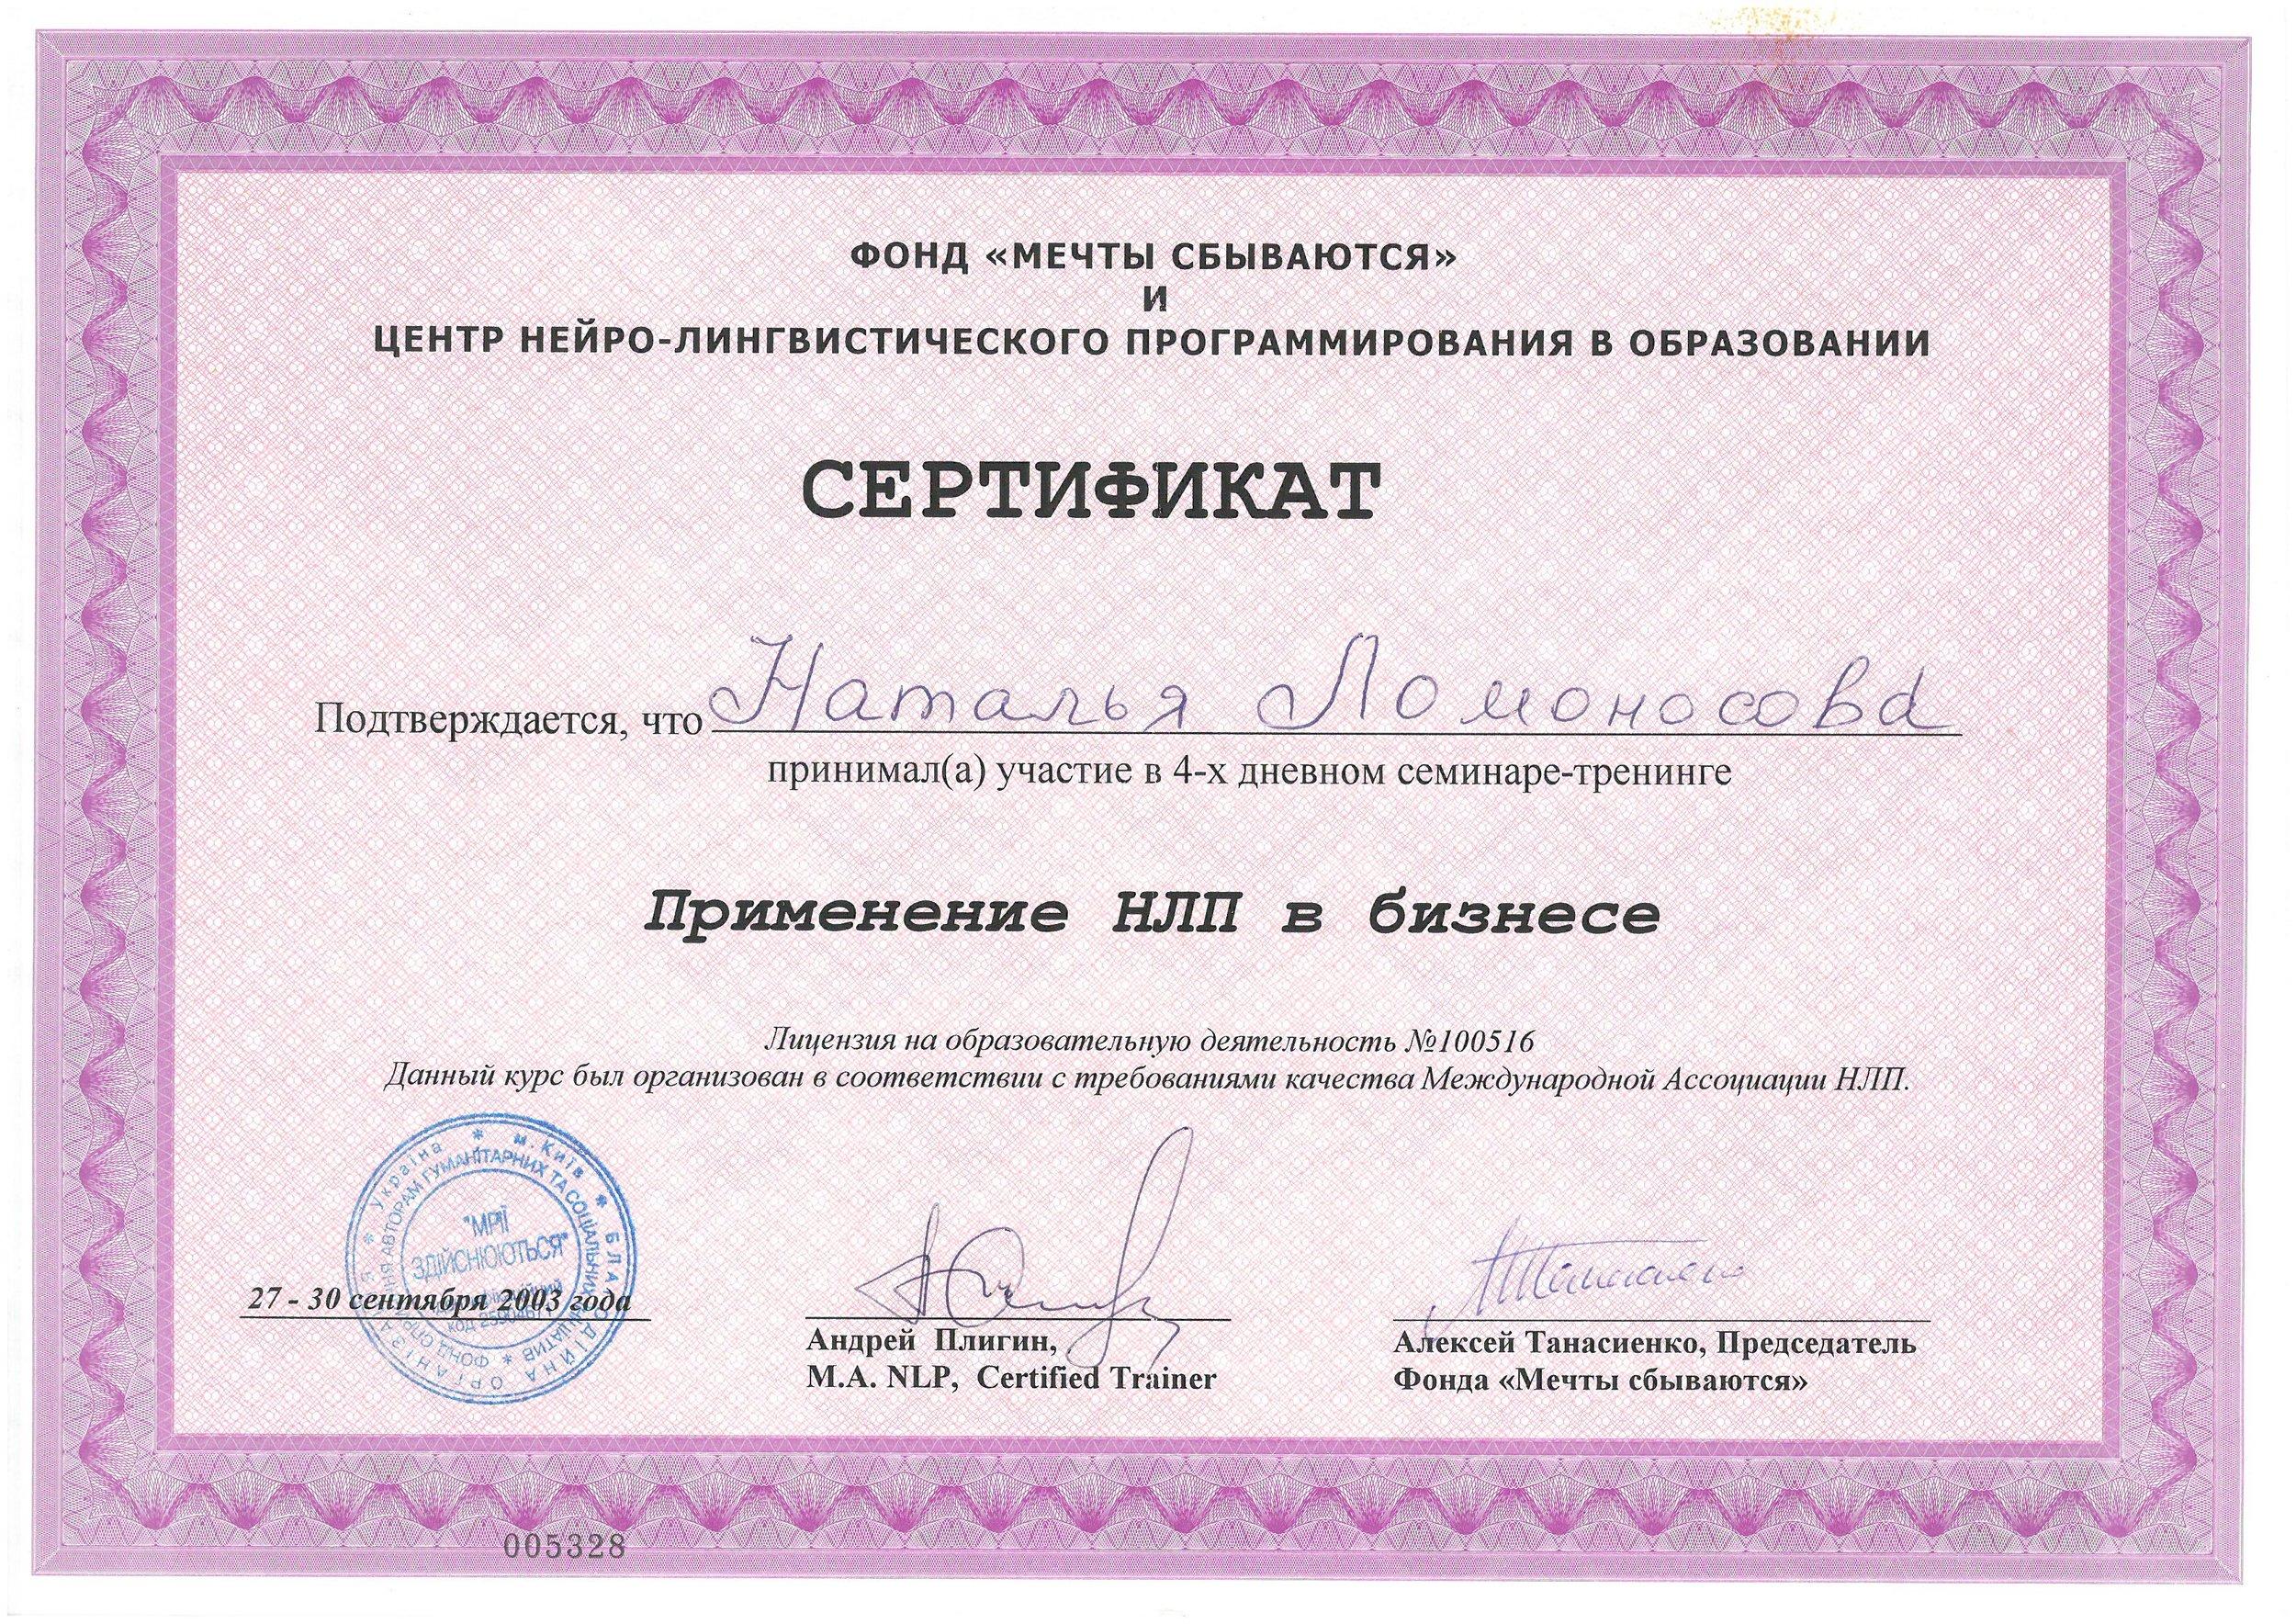 SKMBT_C224e17060618120_Сторінка_29.jpg